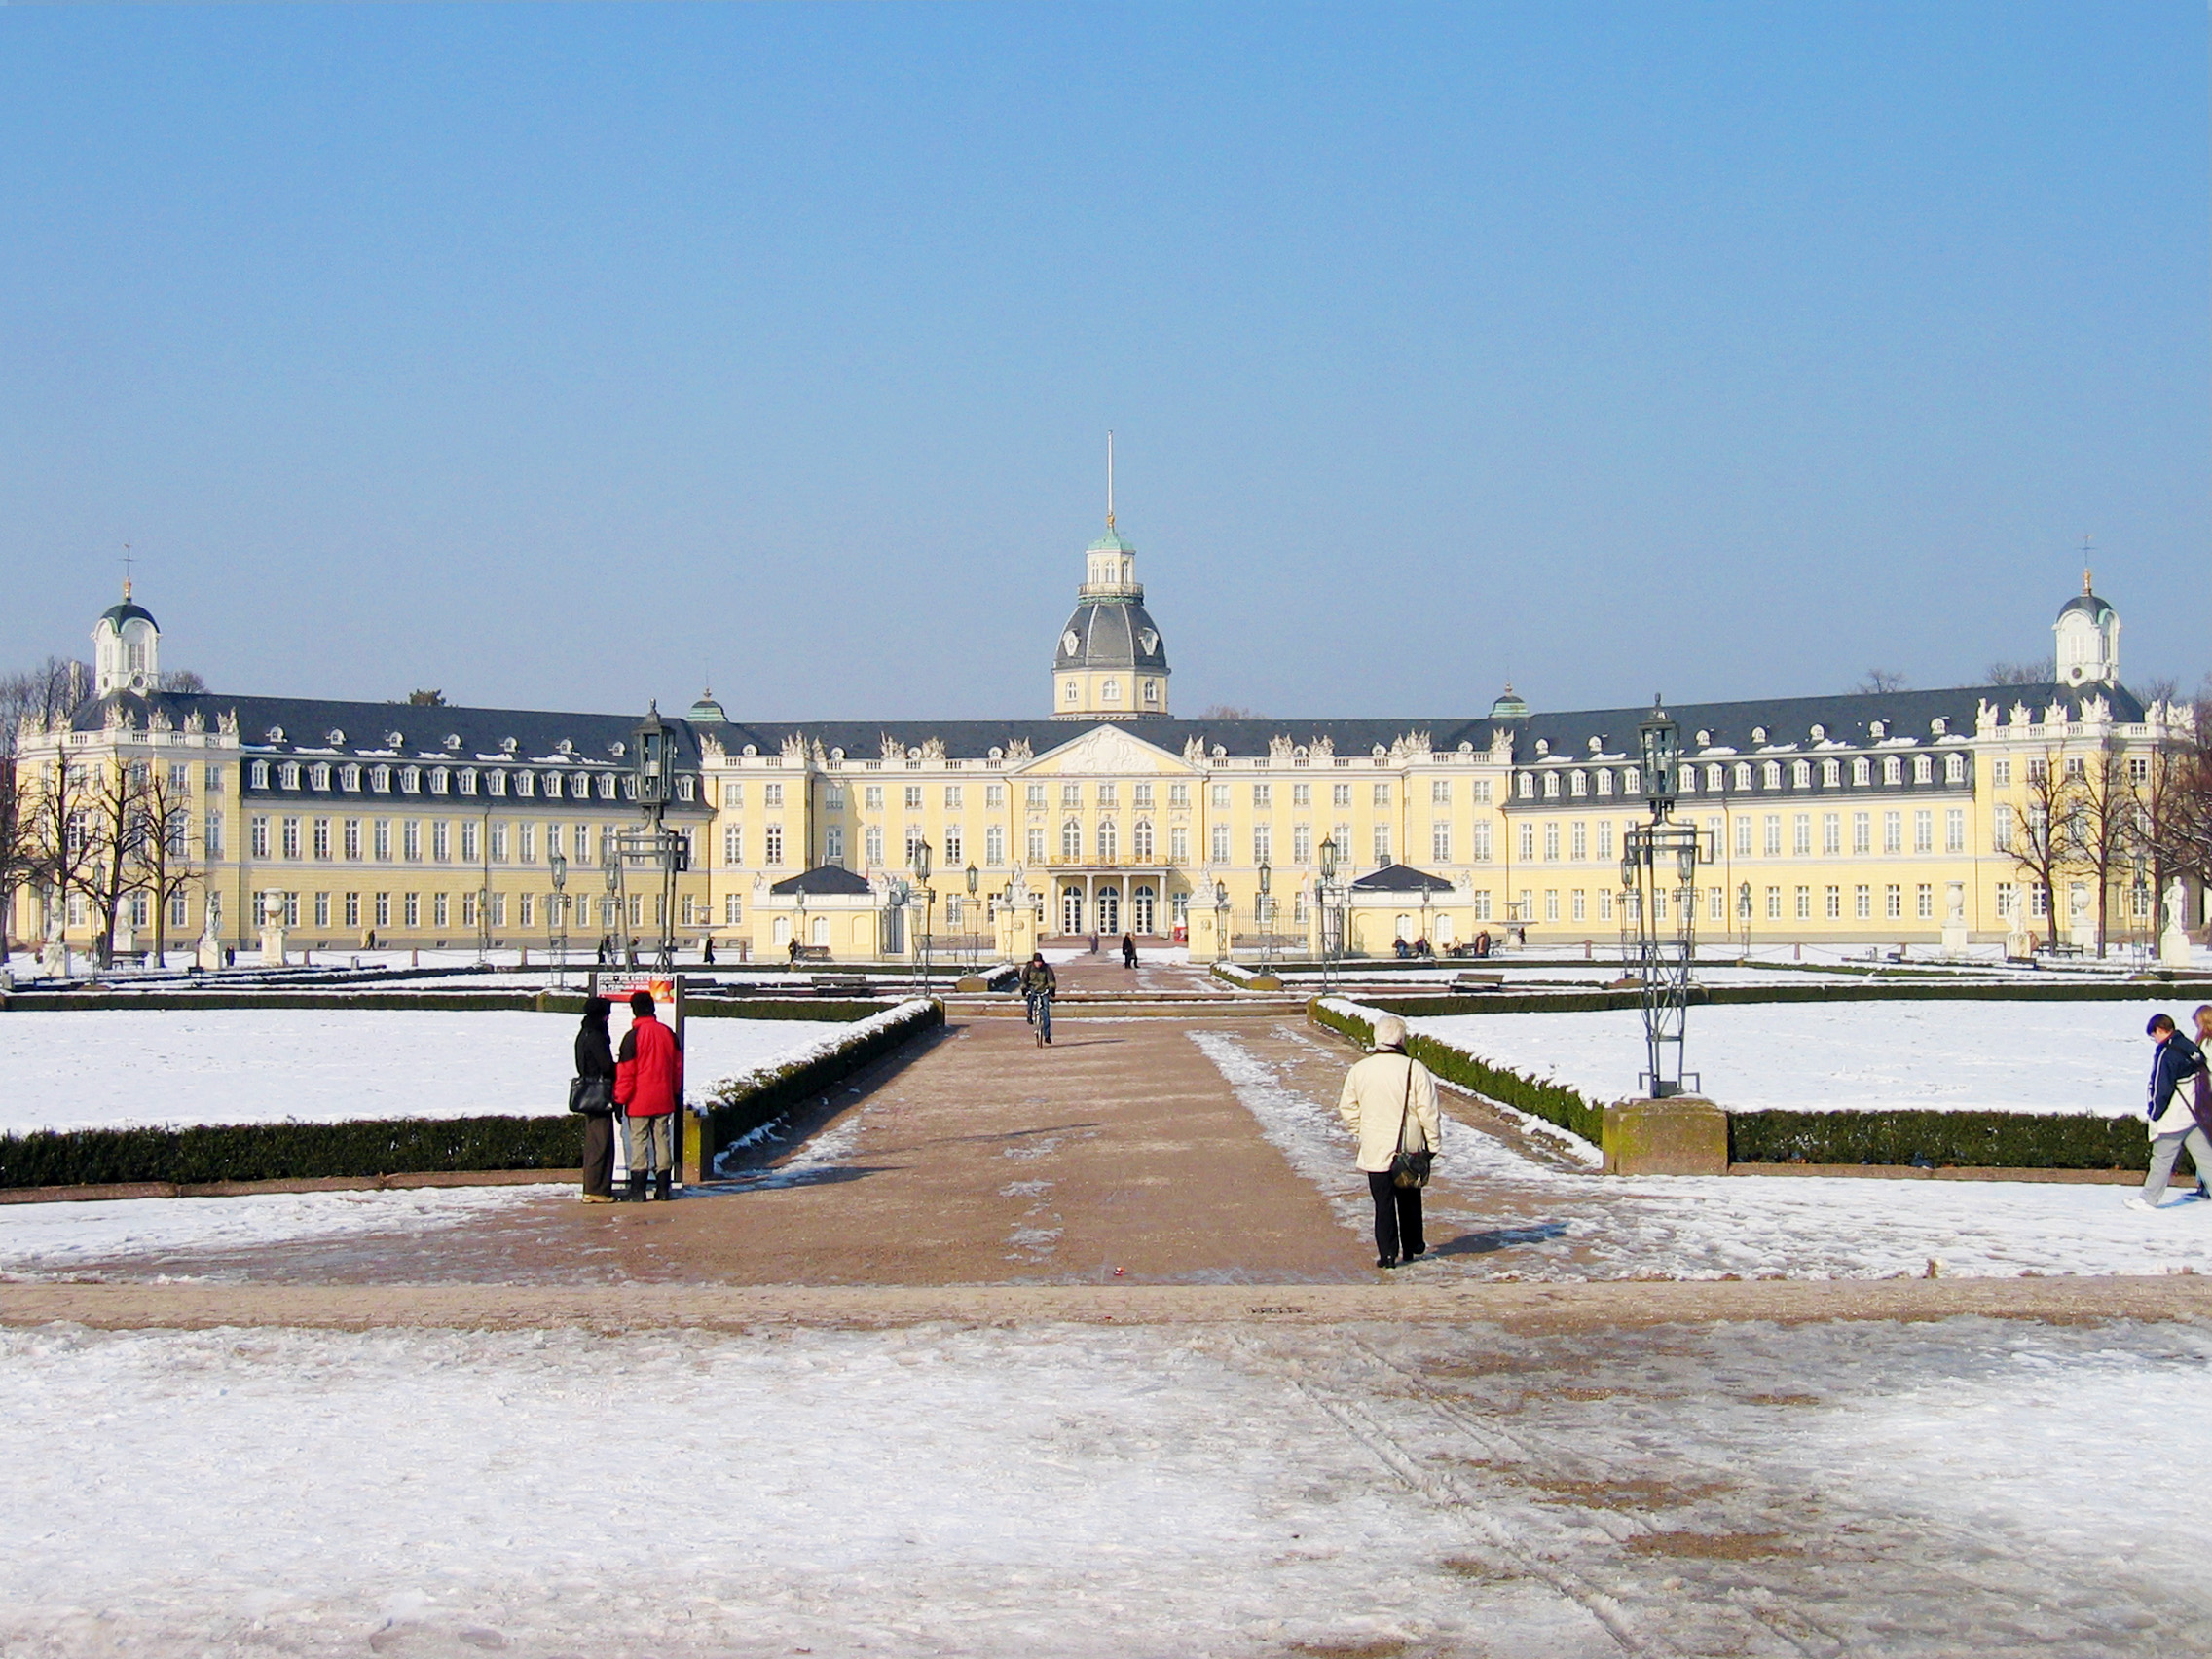 http://de.academic.ru/pictures/dewiki/107/karlsruhe-schloss-meph666-2005-feb-25-pic2.jpg